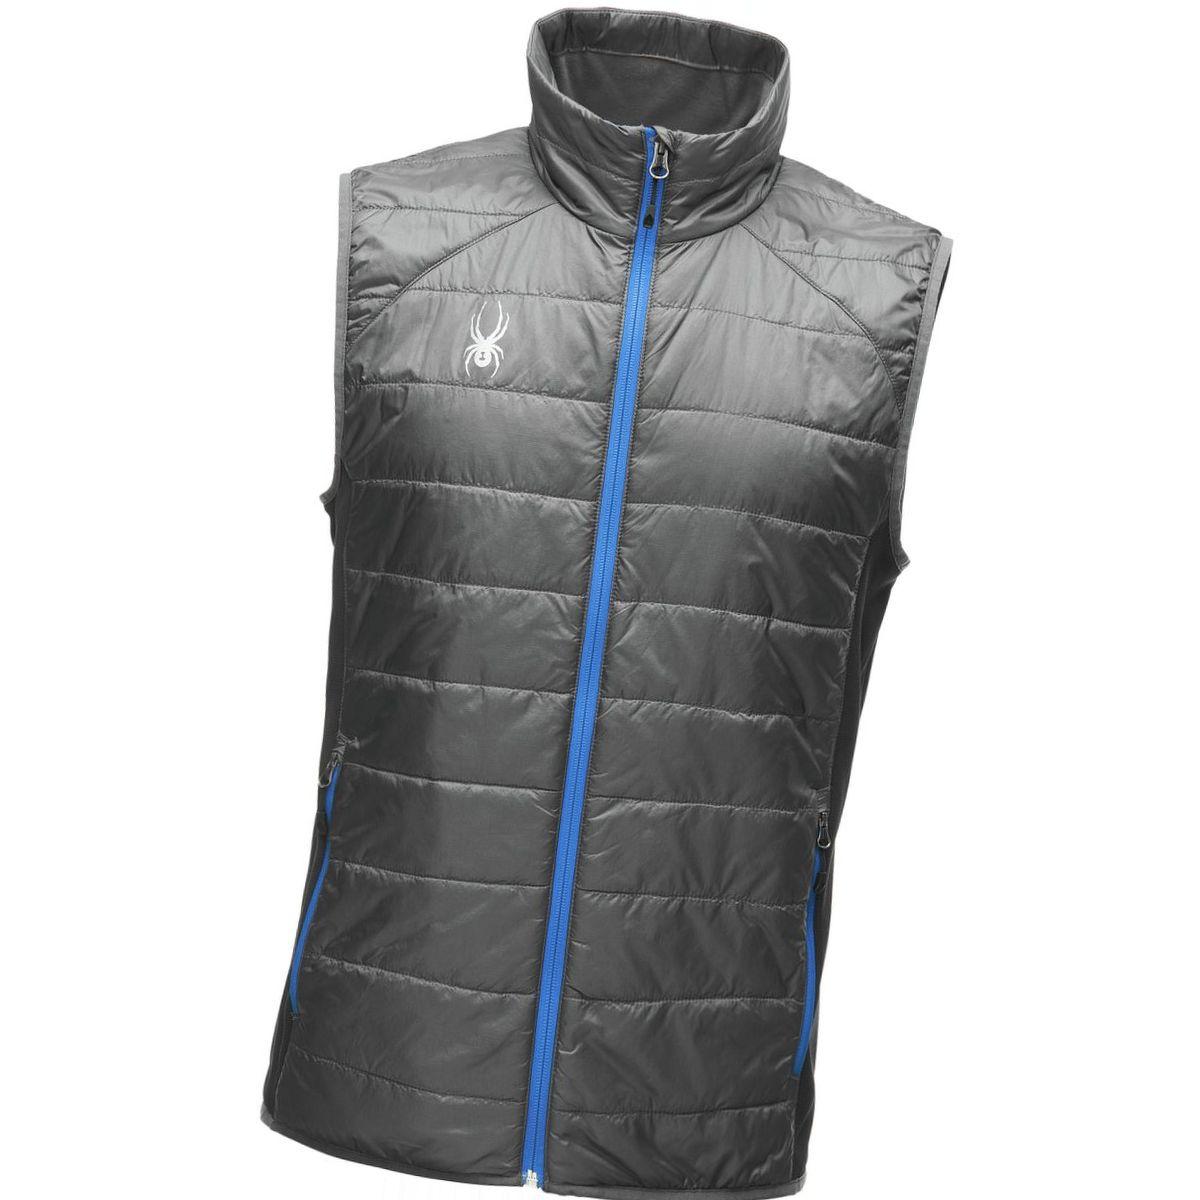 Spyder Glissade Insulated Vest - Men's